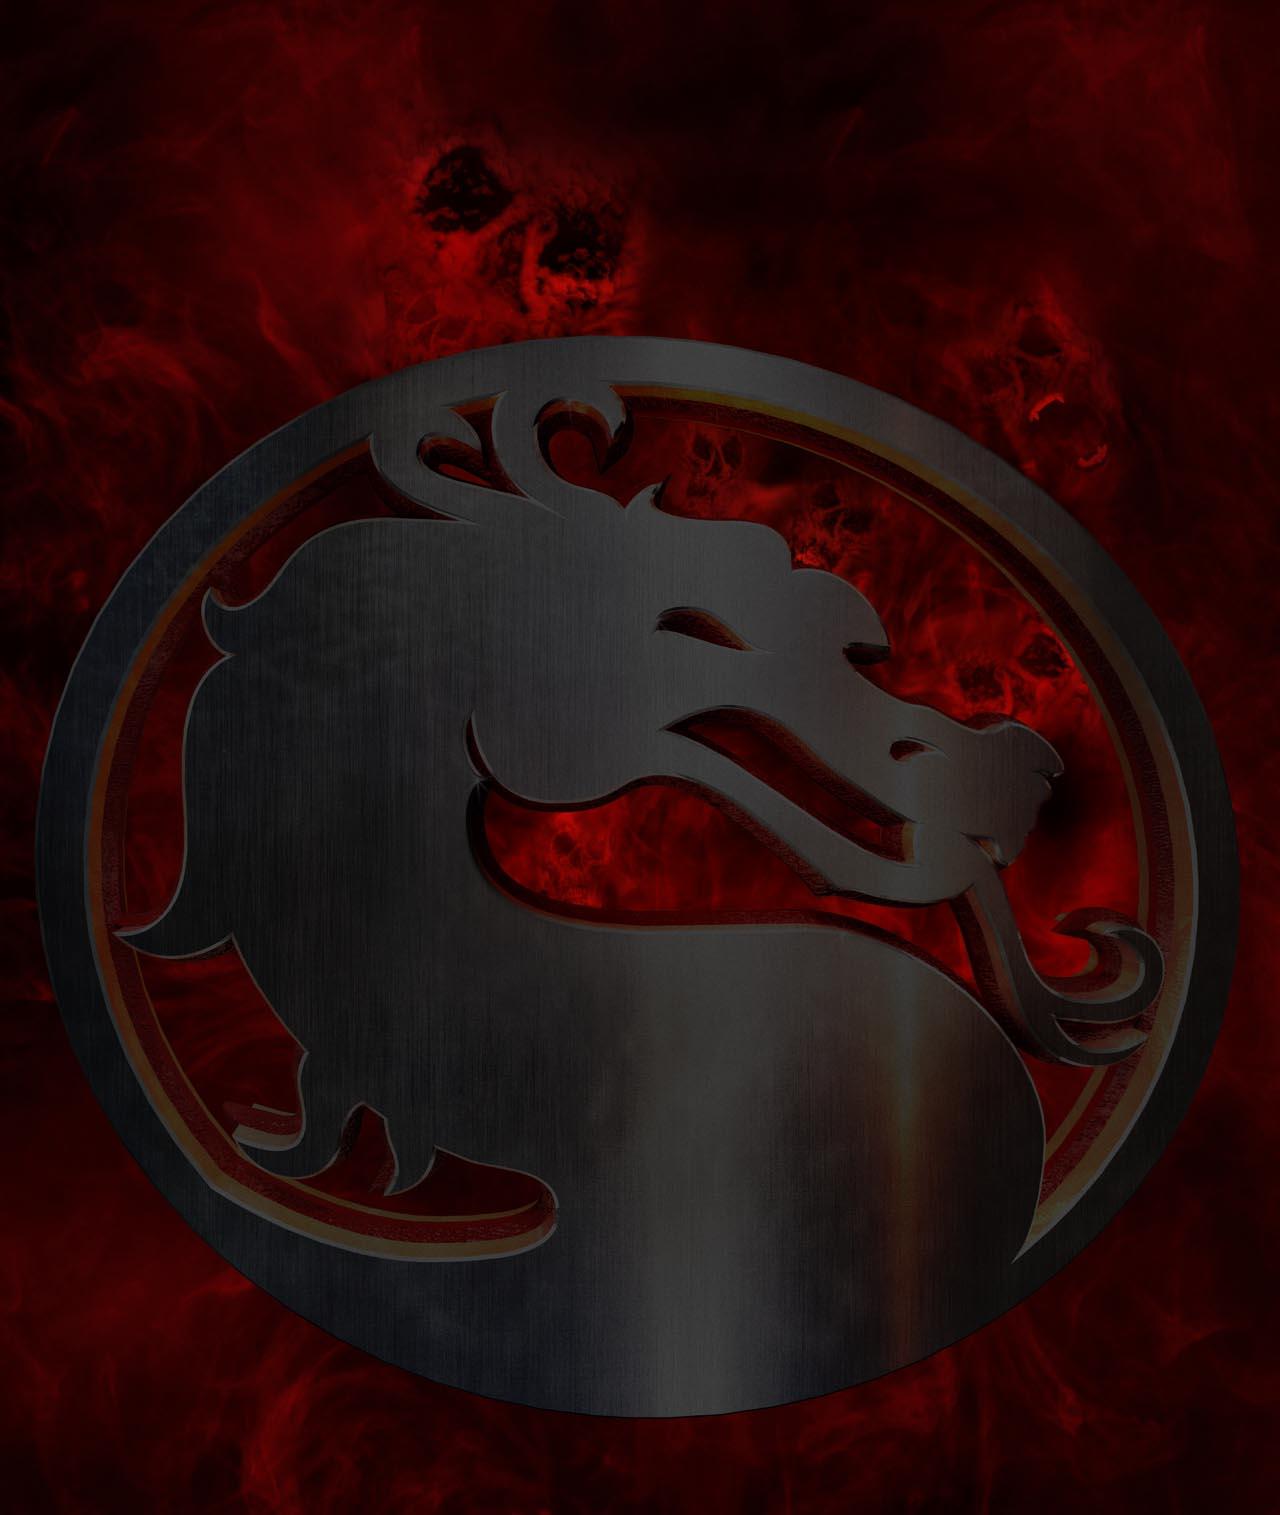 Mortal Kombat Dragon: Mortal Kombat Dragon Logos